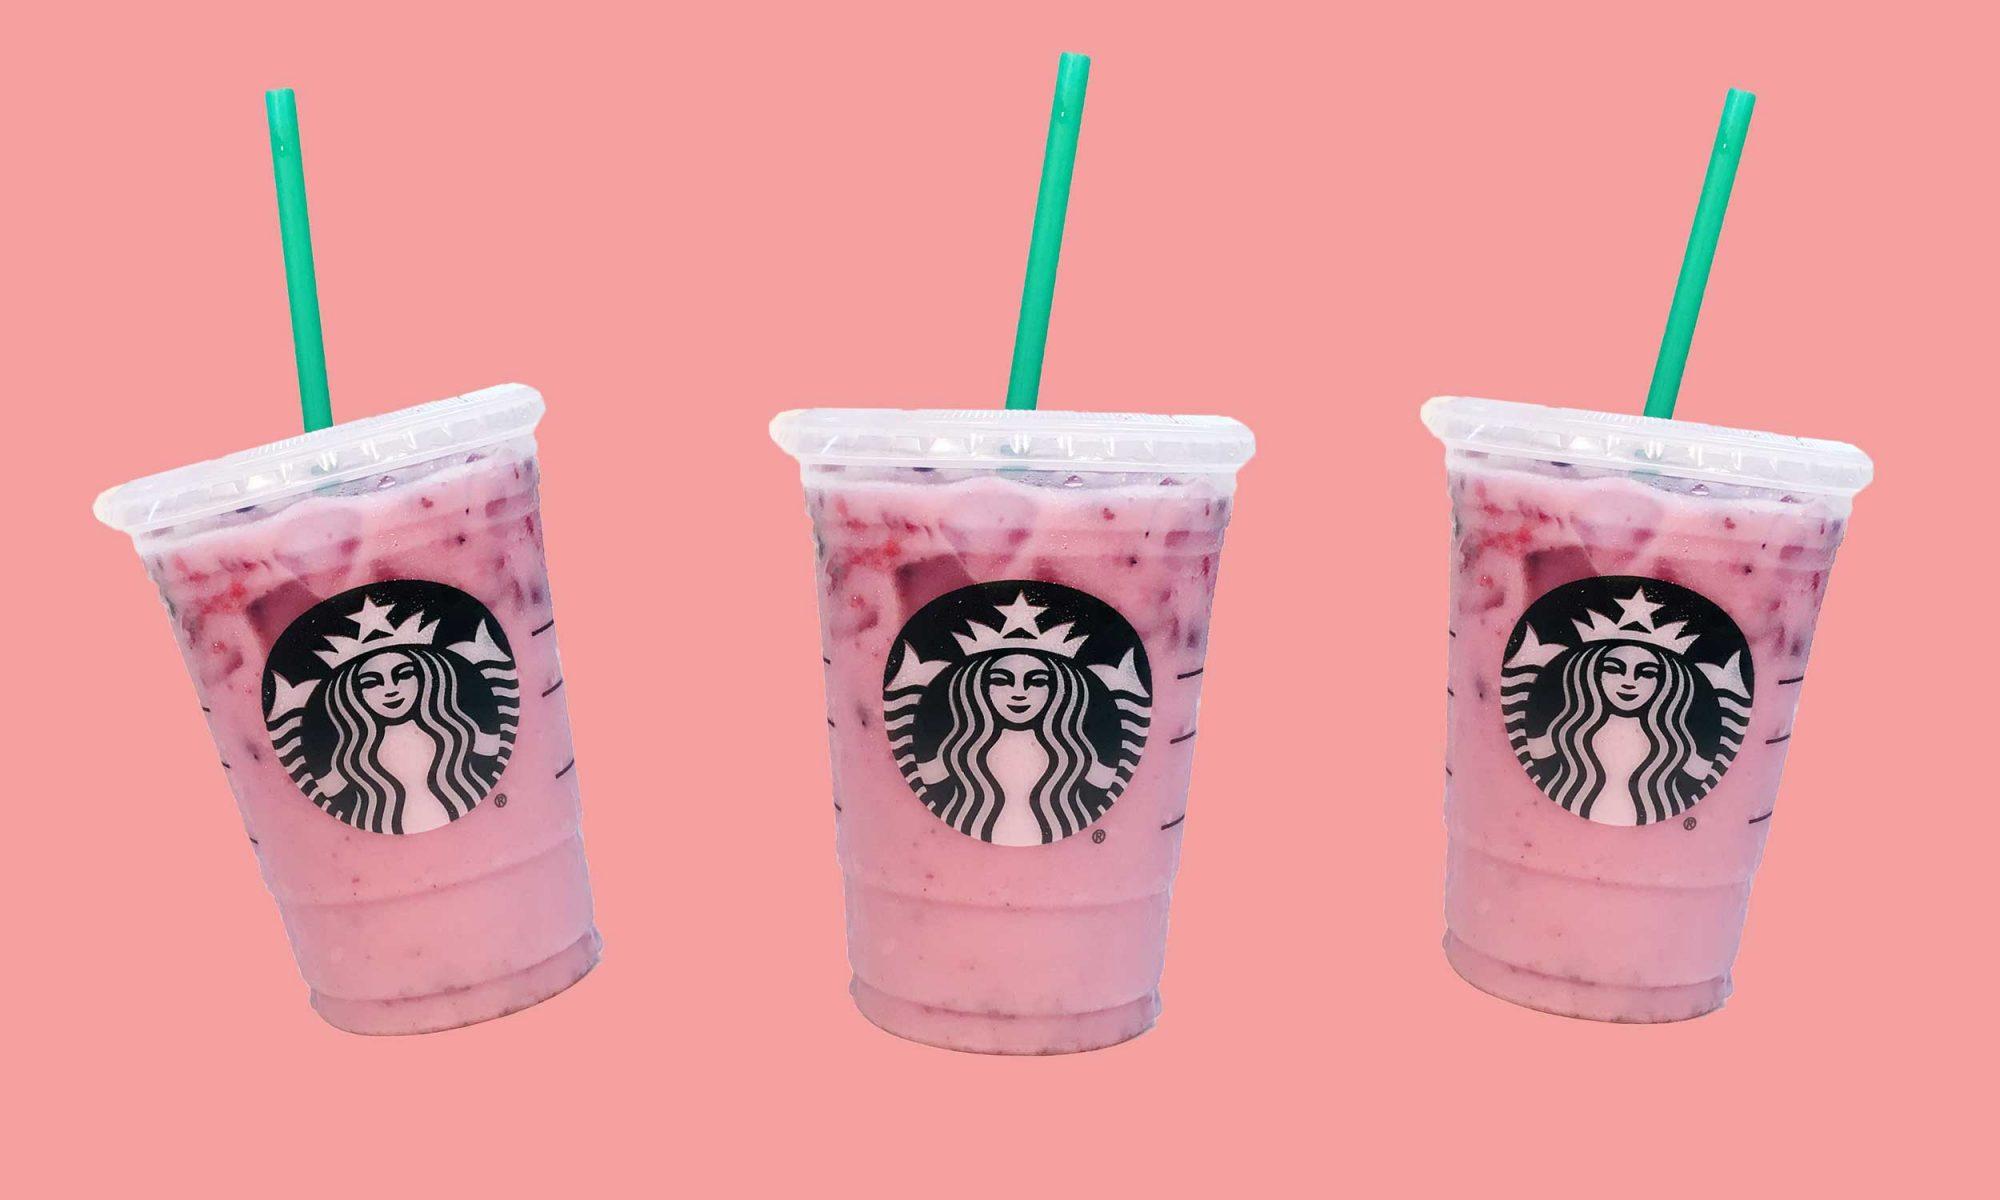 EC: The Biggest Starbucks Trend of 2016 Won't Surprise You